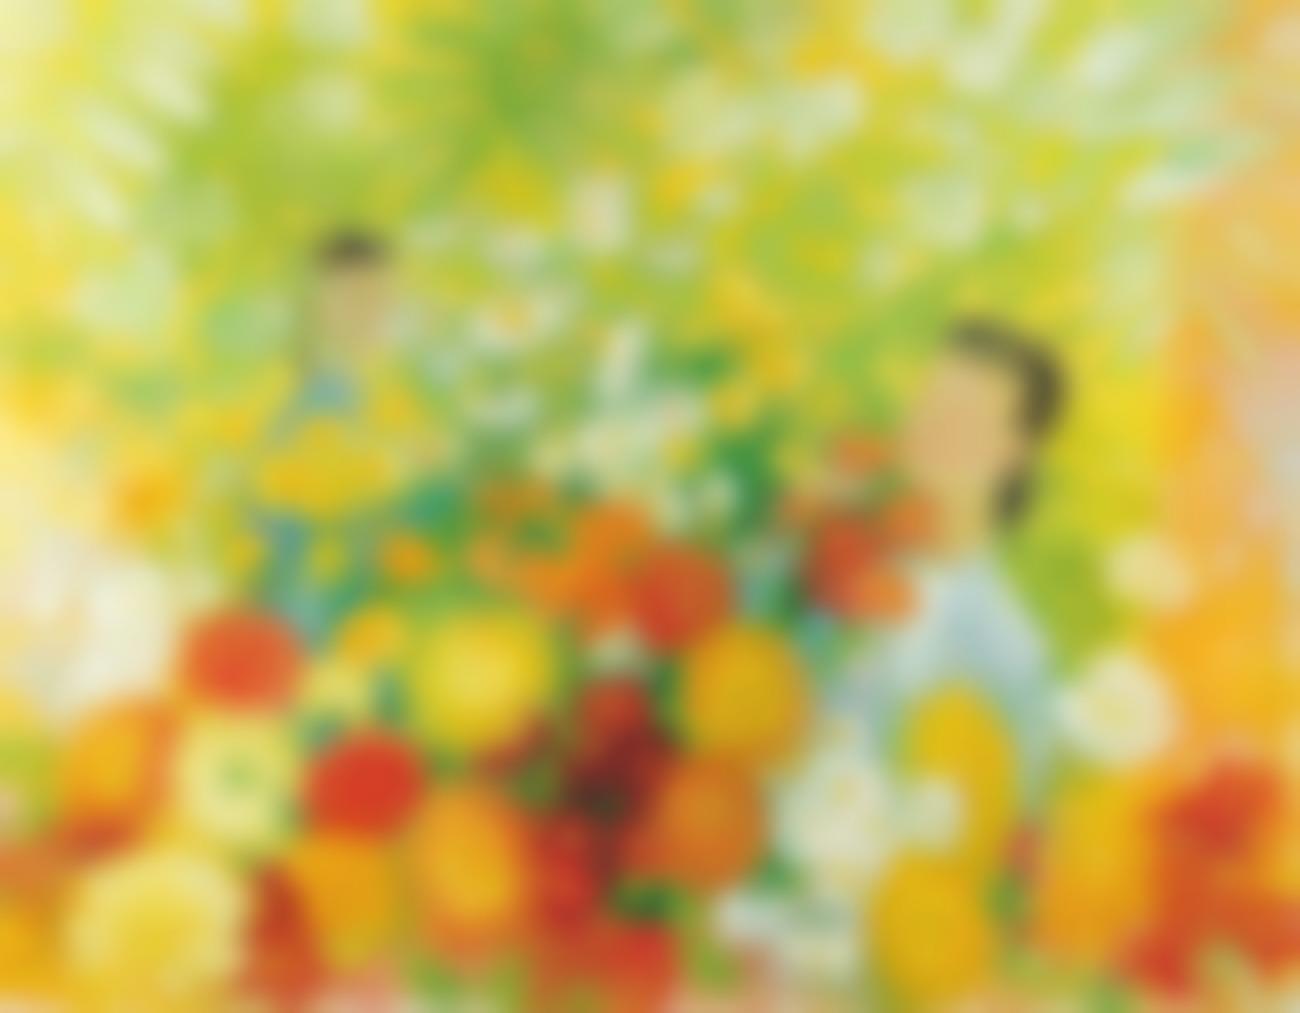 Le Pho-Deux Filles Dans Le Jardin (Two Girls In The Flower Garden)-1975